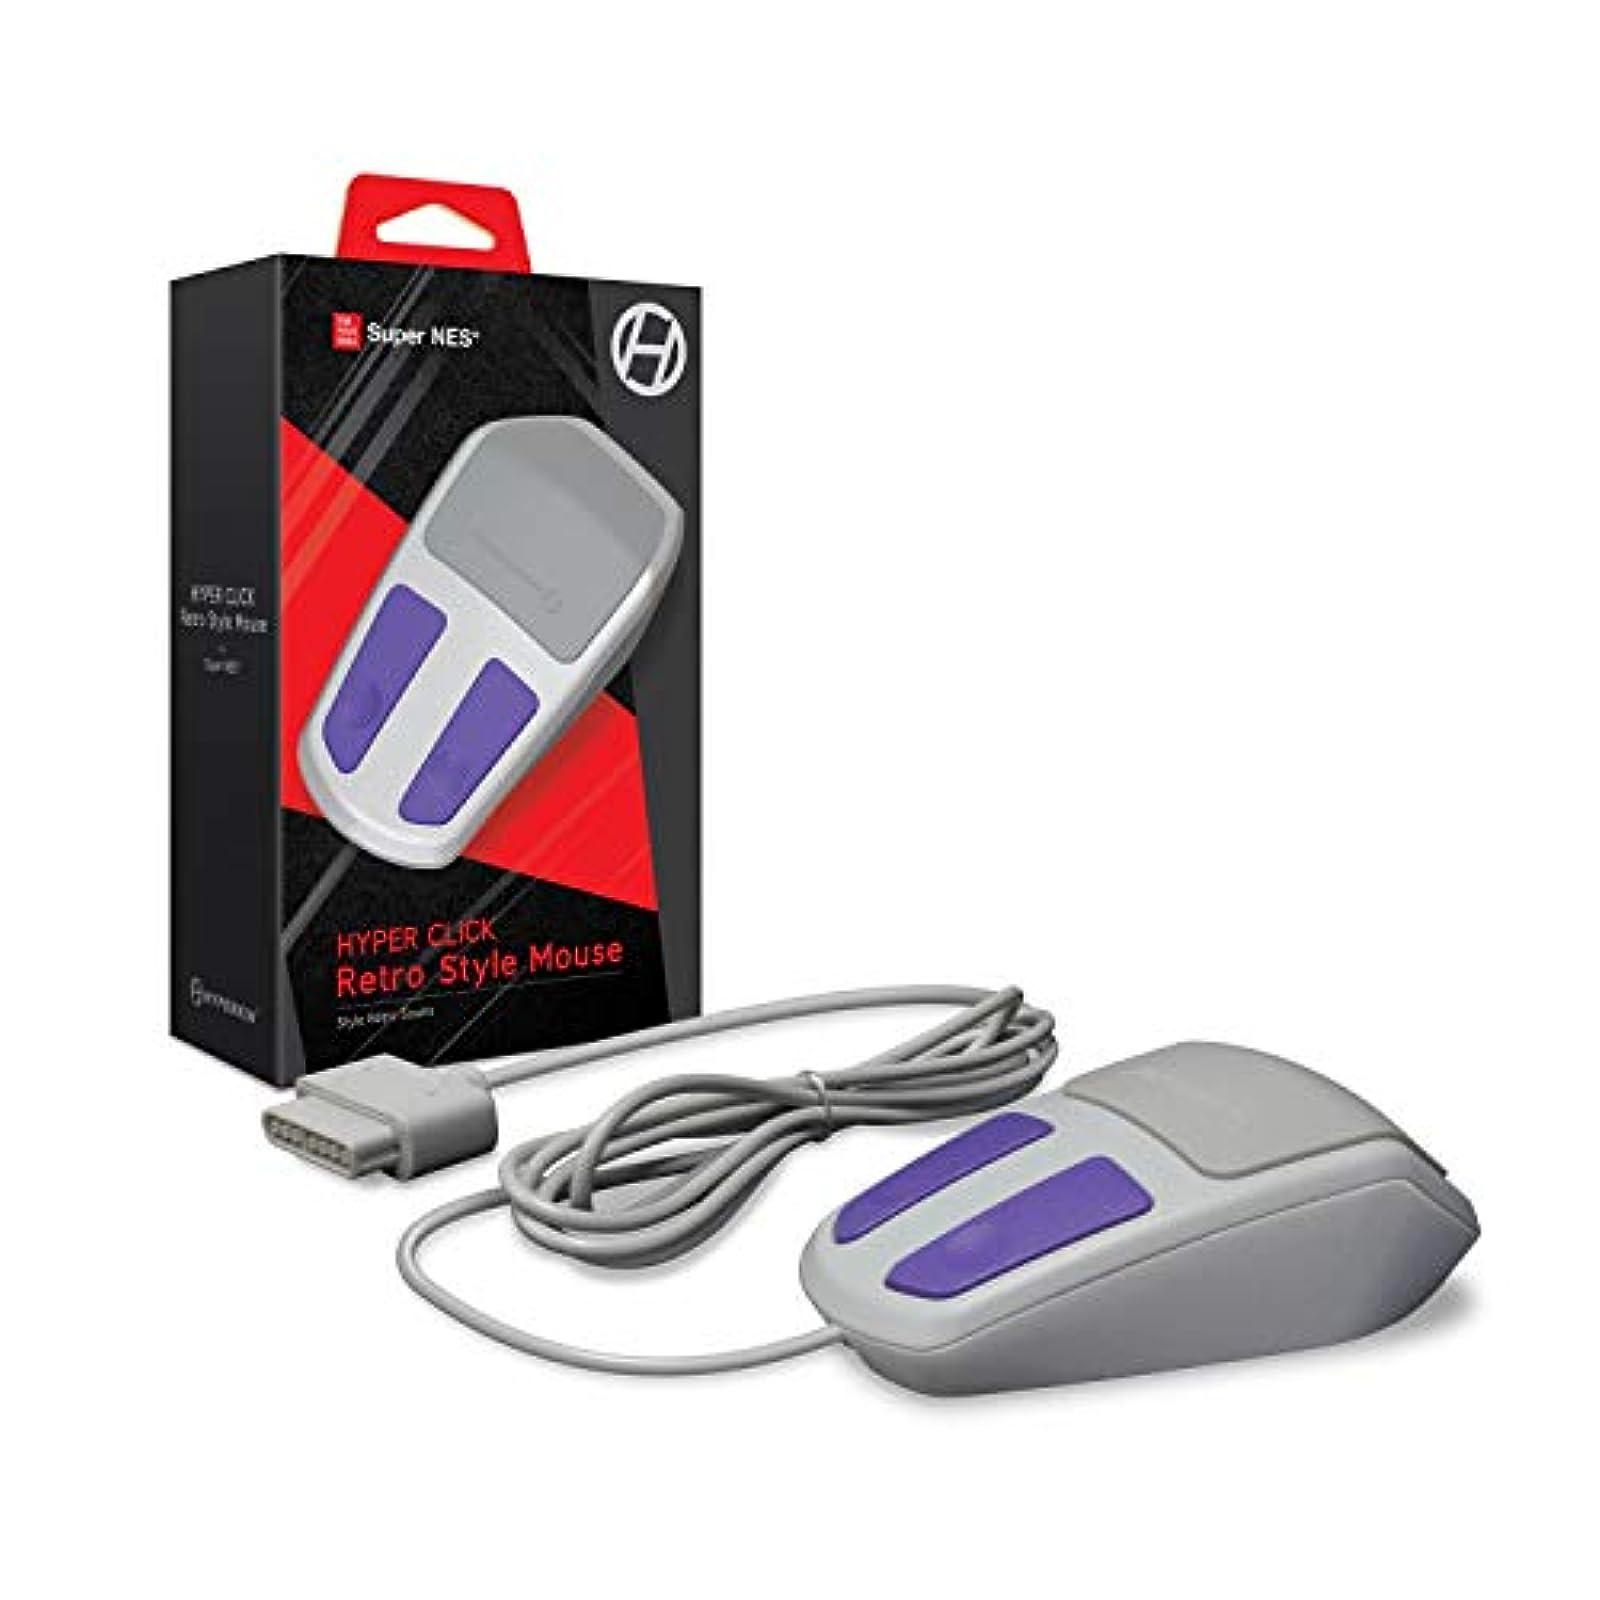 Hyperkin Hyper Click Retro Style Mouse For Super NES For Super Nintendo SNES